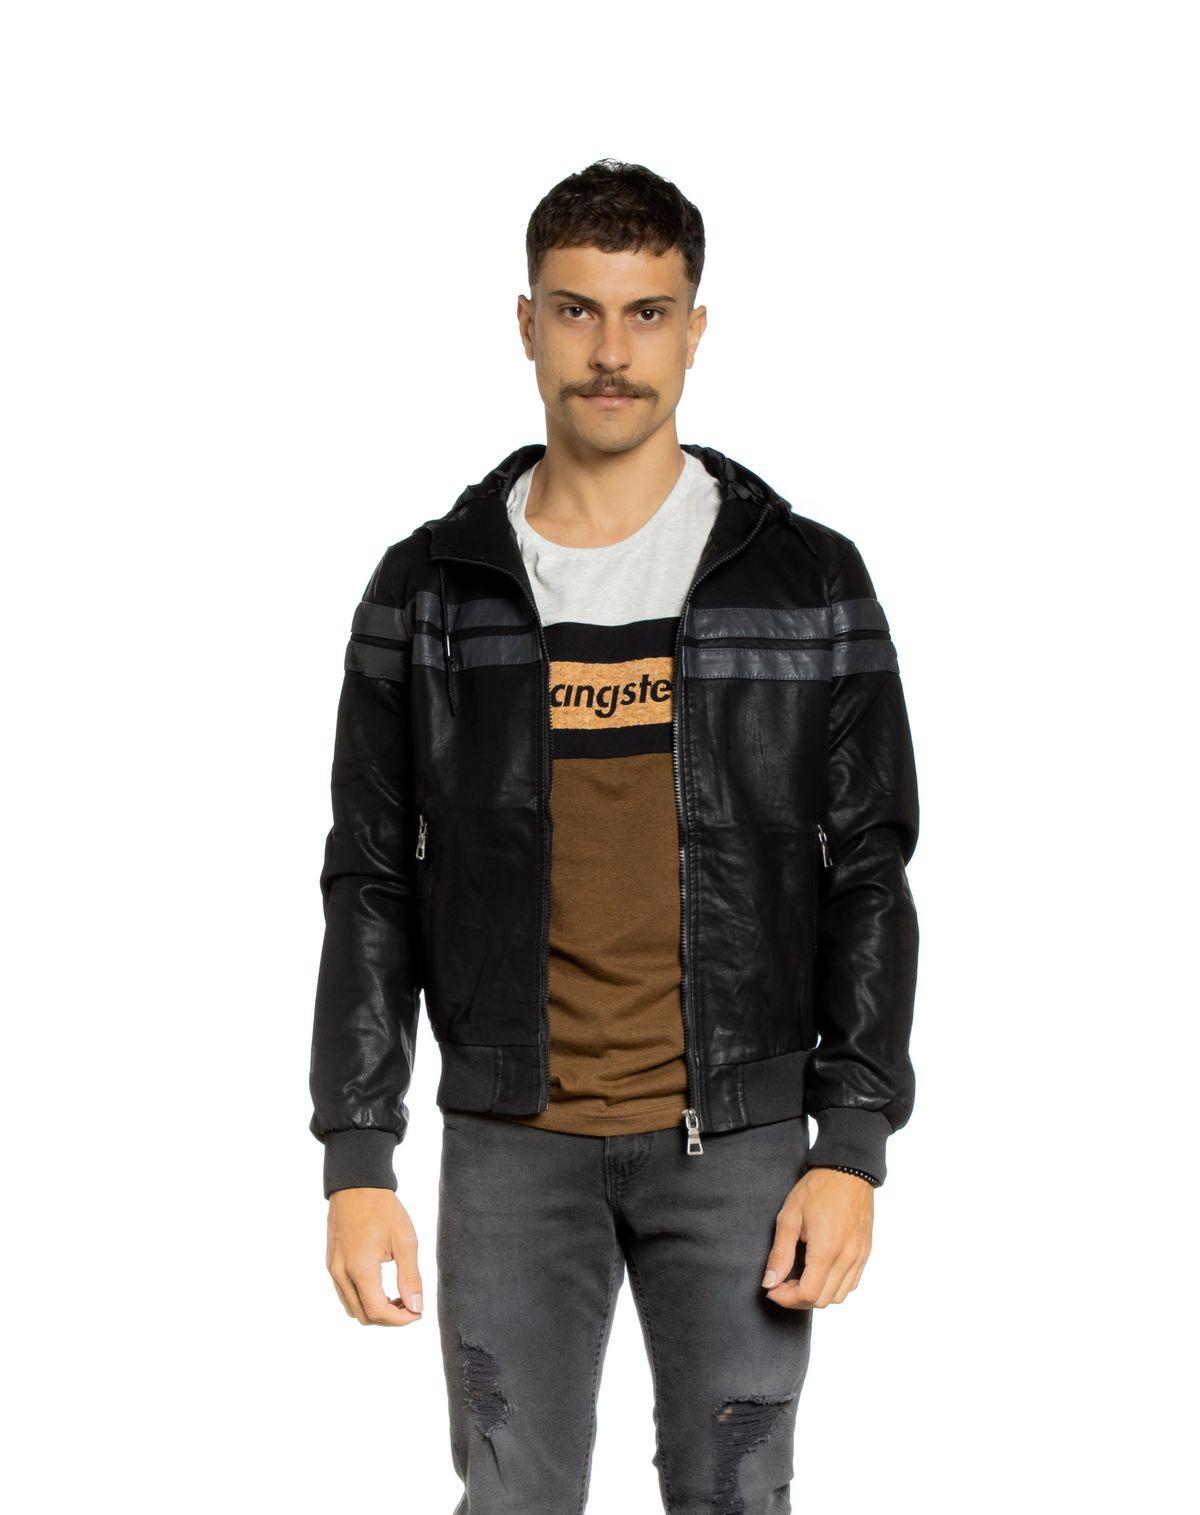 594913008-jaqueta-biker-masculina-recortes--capuz-ziper-preto-chumbo-gg-9fa